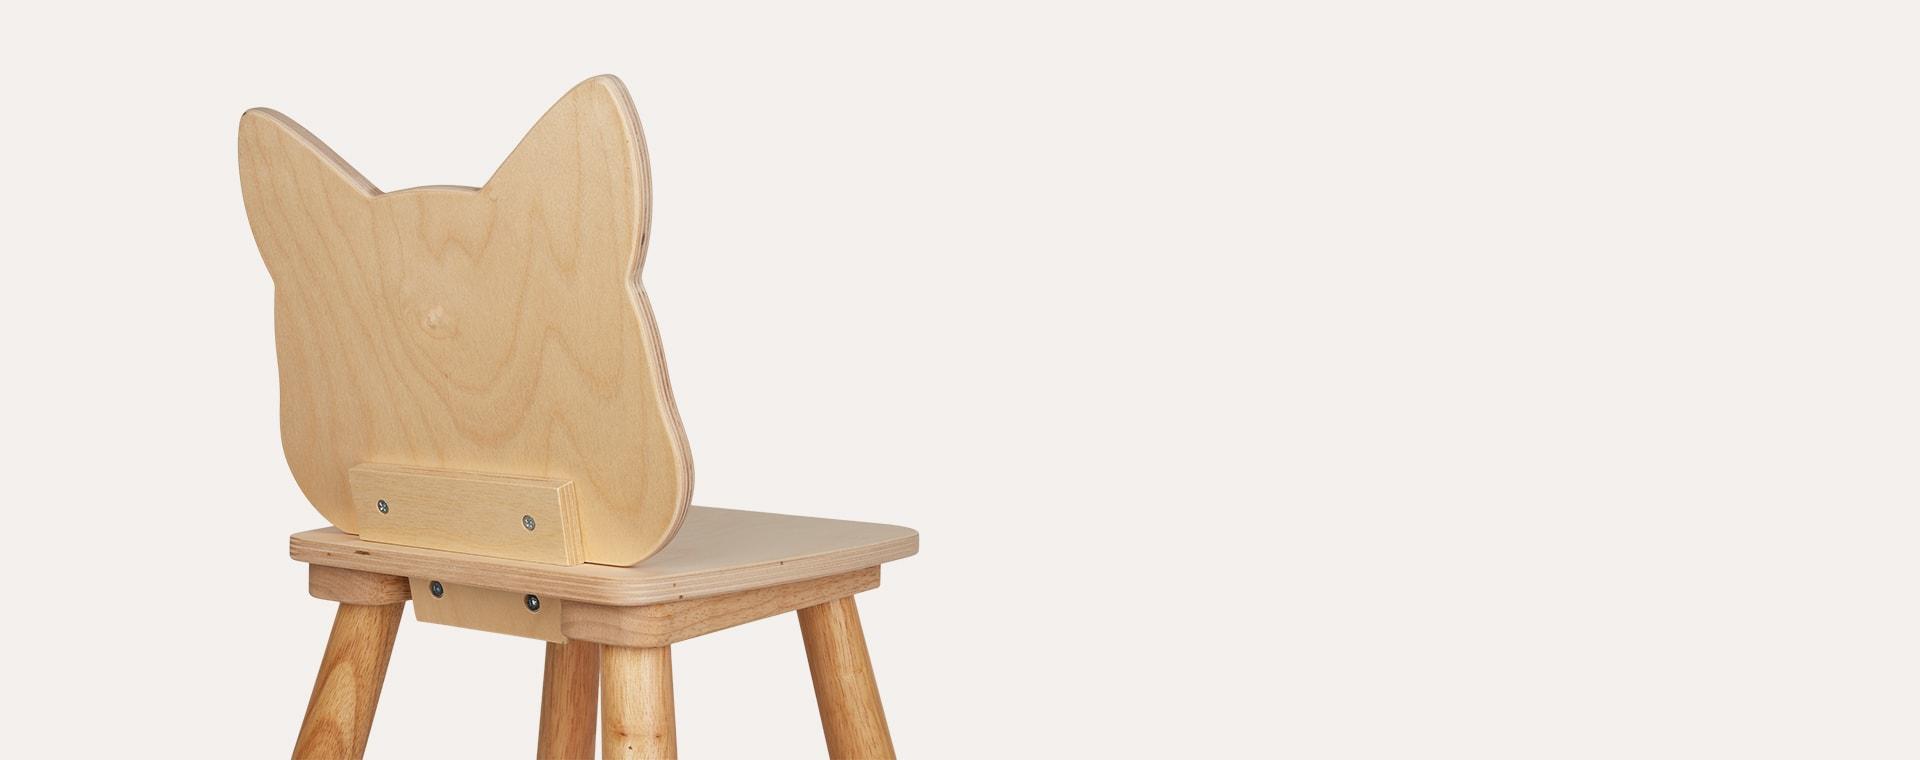 Fox Tender Leaf Toys Forest Chair